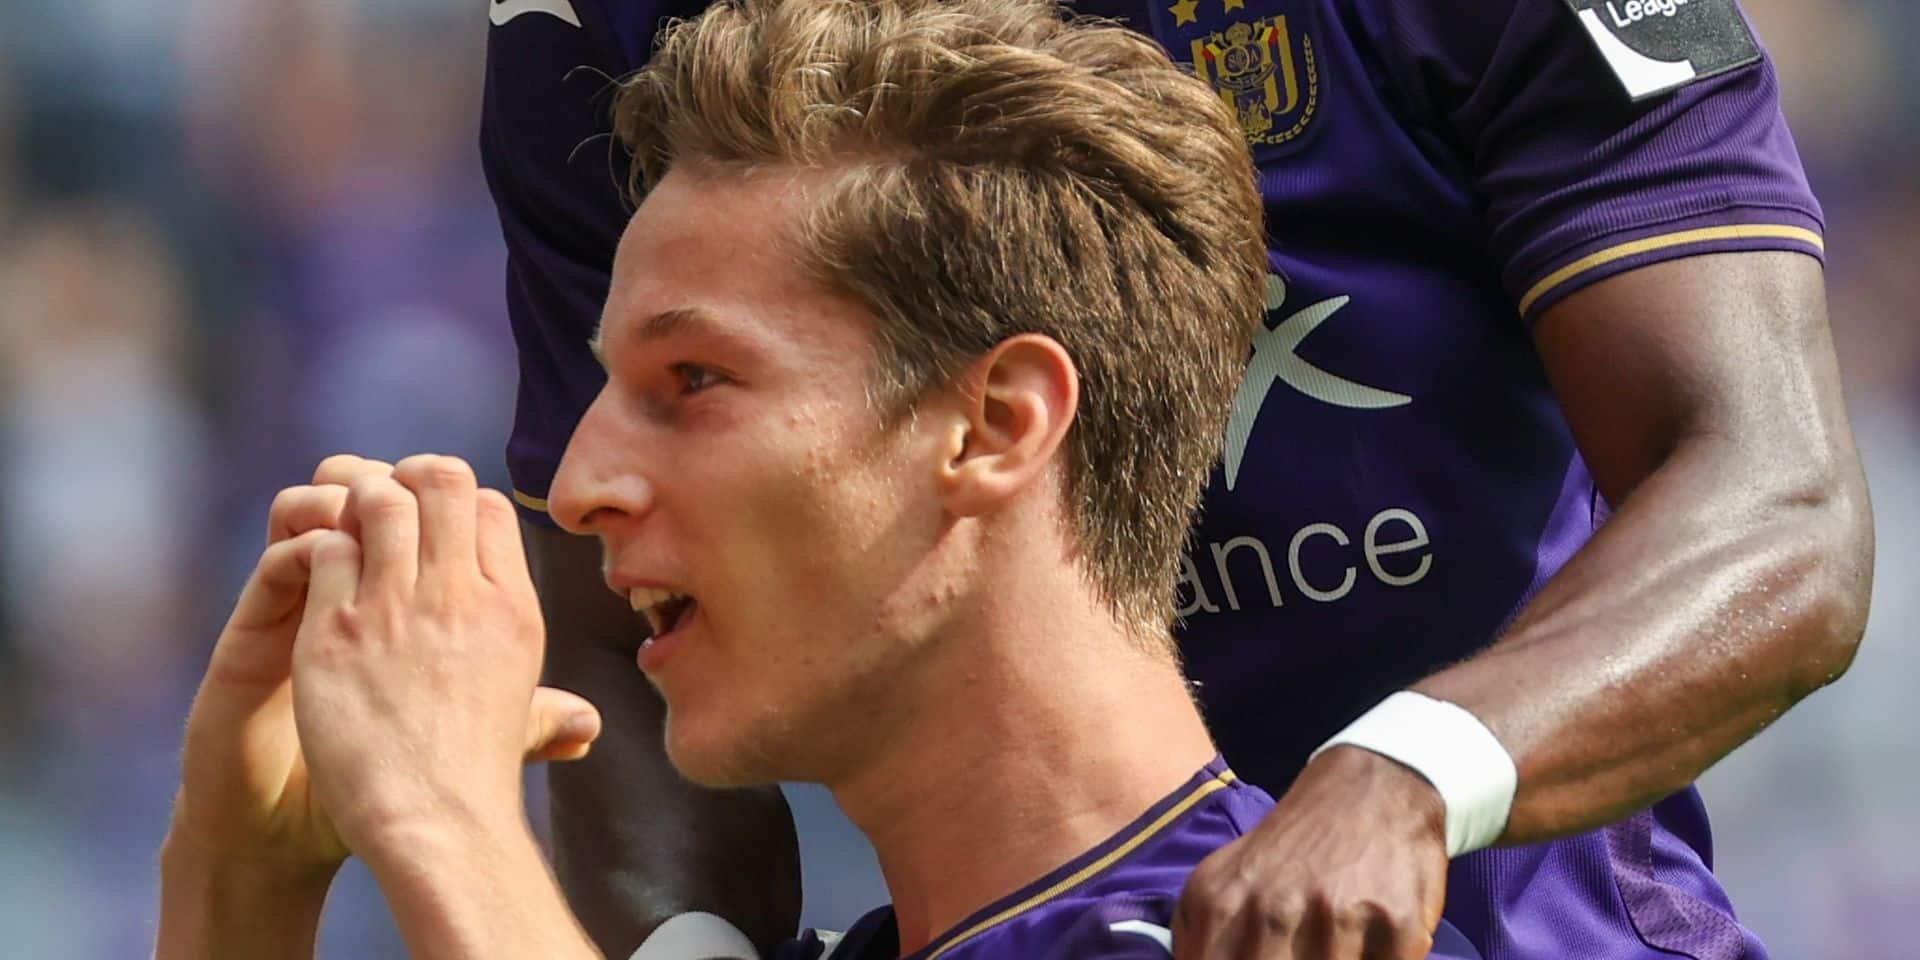 Anderlecht ne doit pas retomber dans la possession inefficace